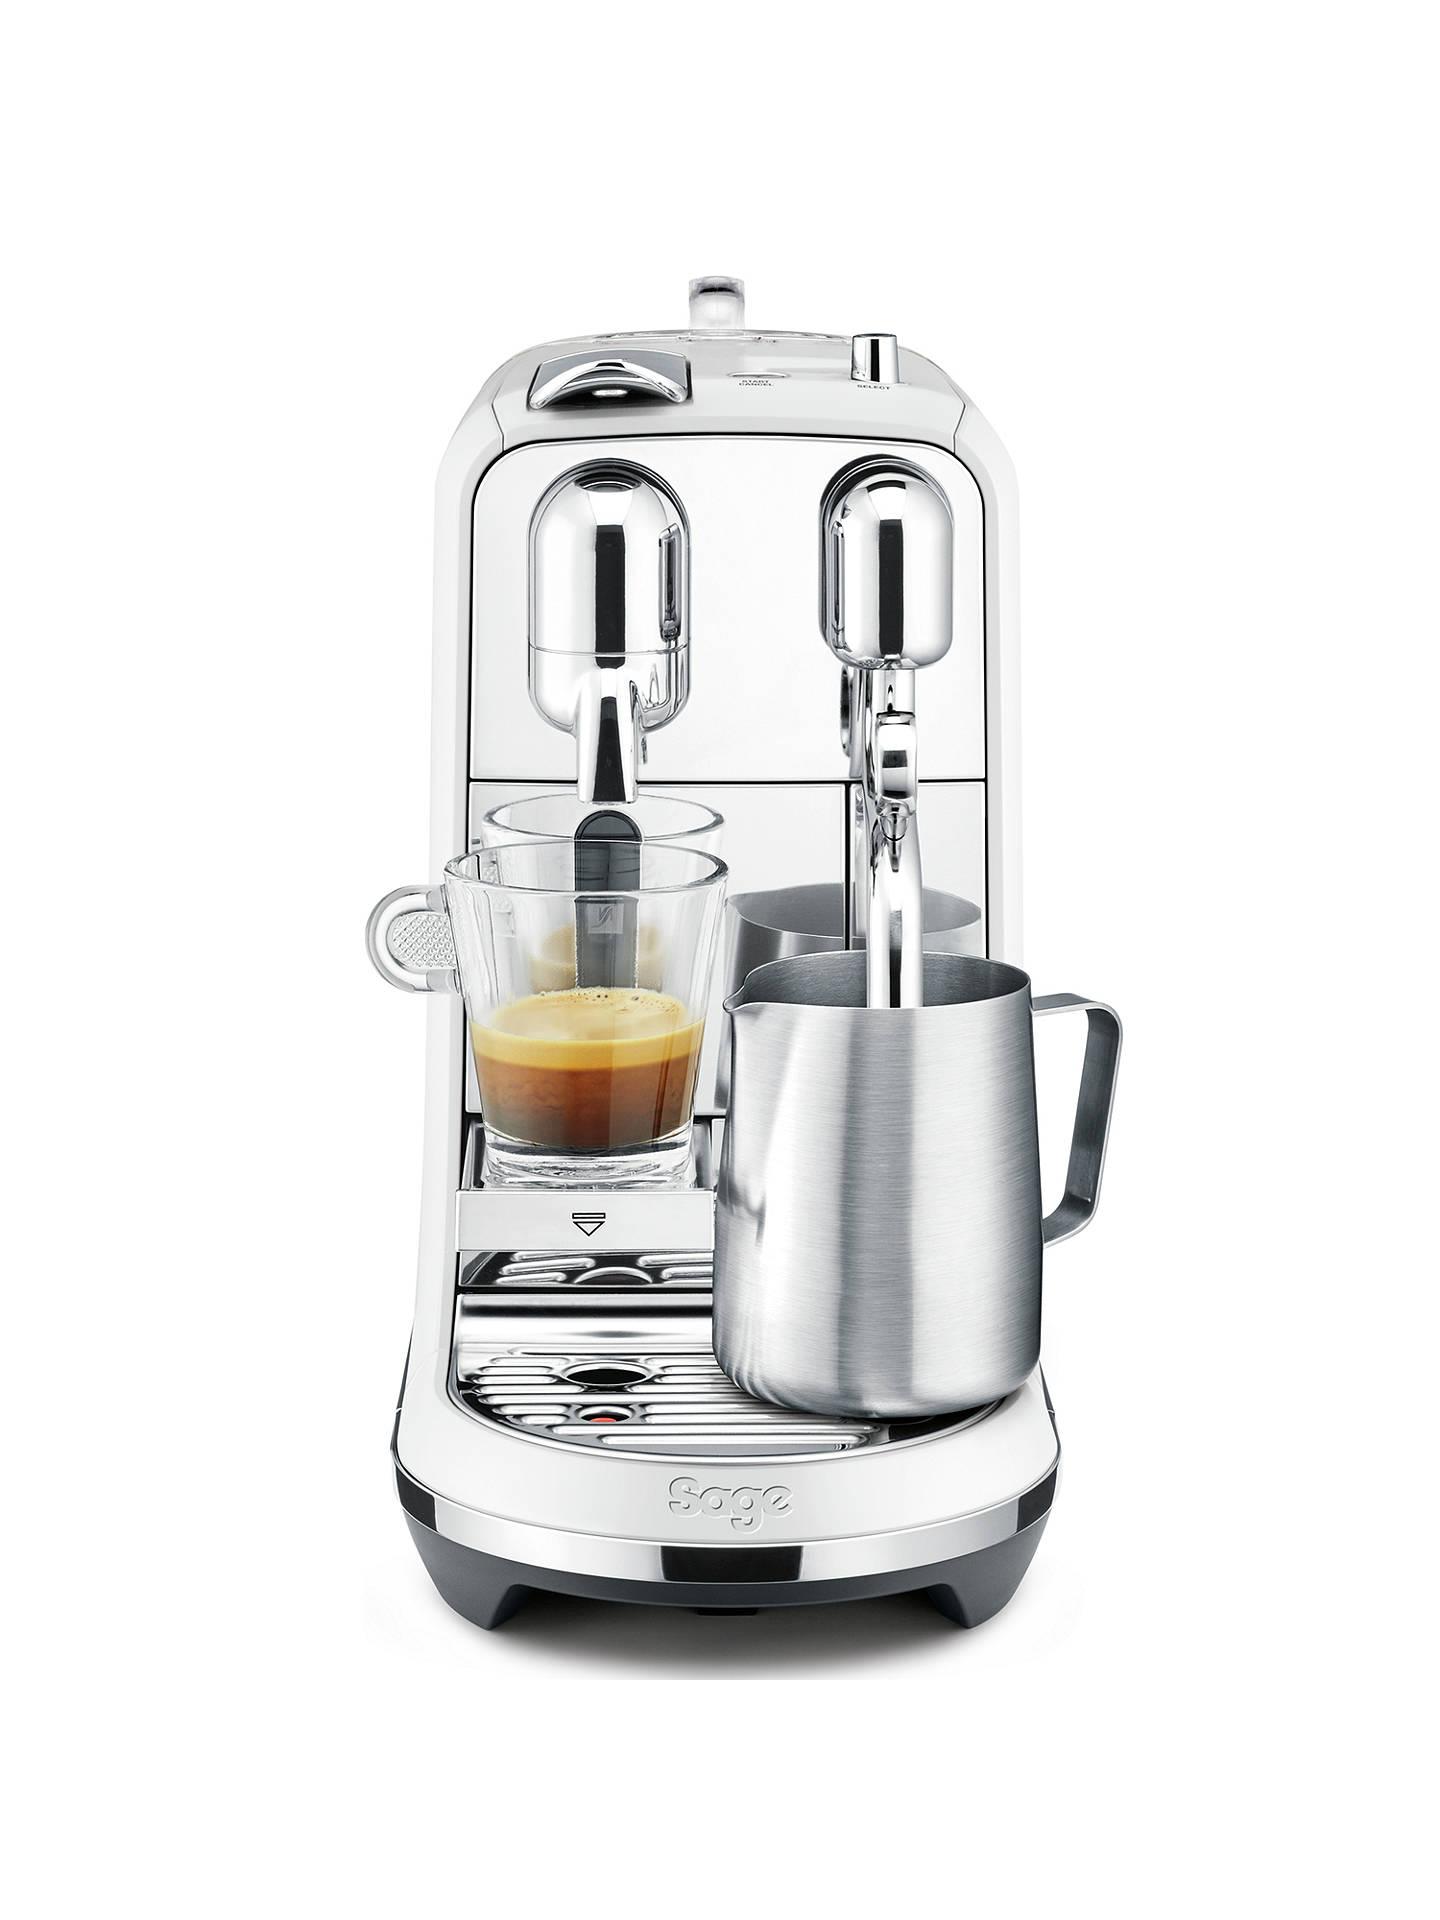 Where Can I Buy A Nespresso Machine